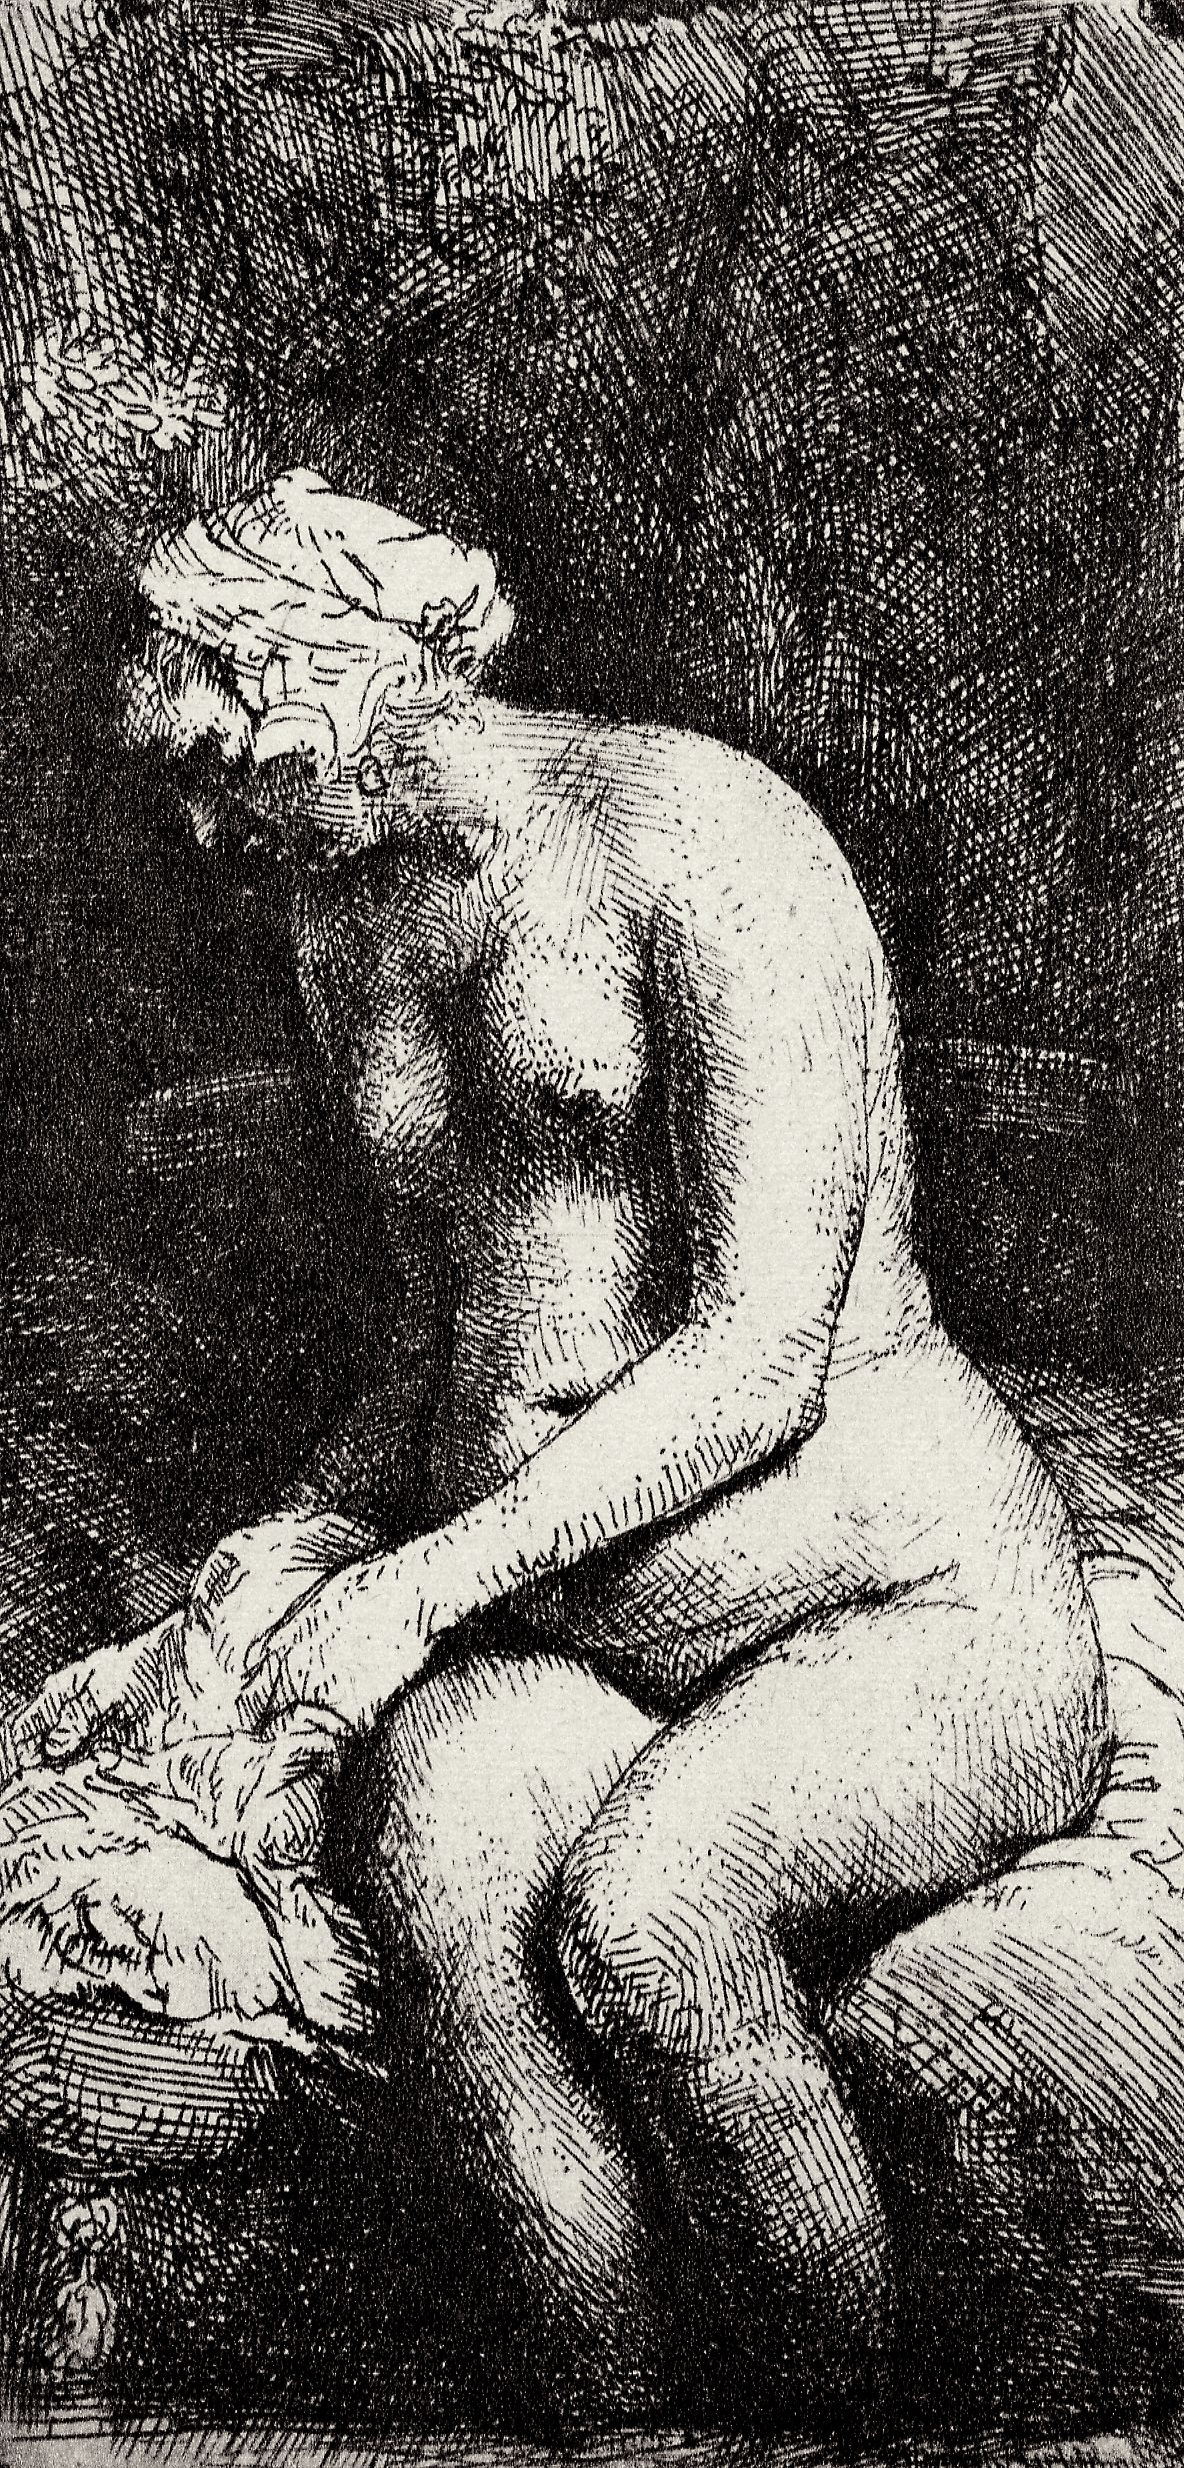 Rembrandt Harmenszoon van Rijn. Nude with legs lowered in water